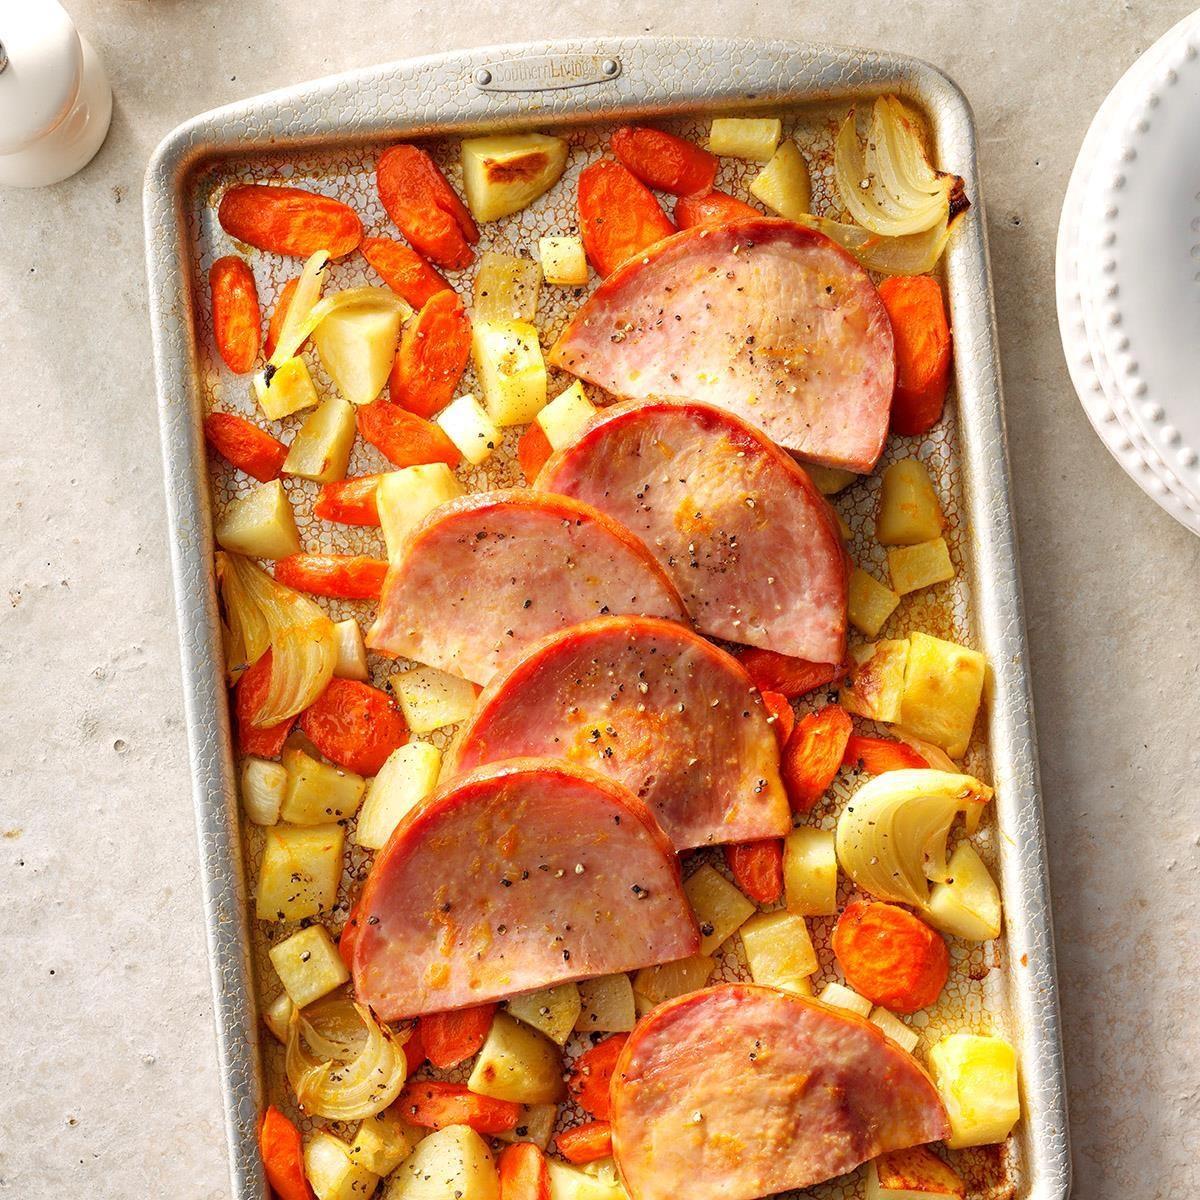 Sunday: Sliced Ham with Roasted Vegetables